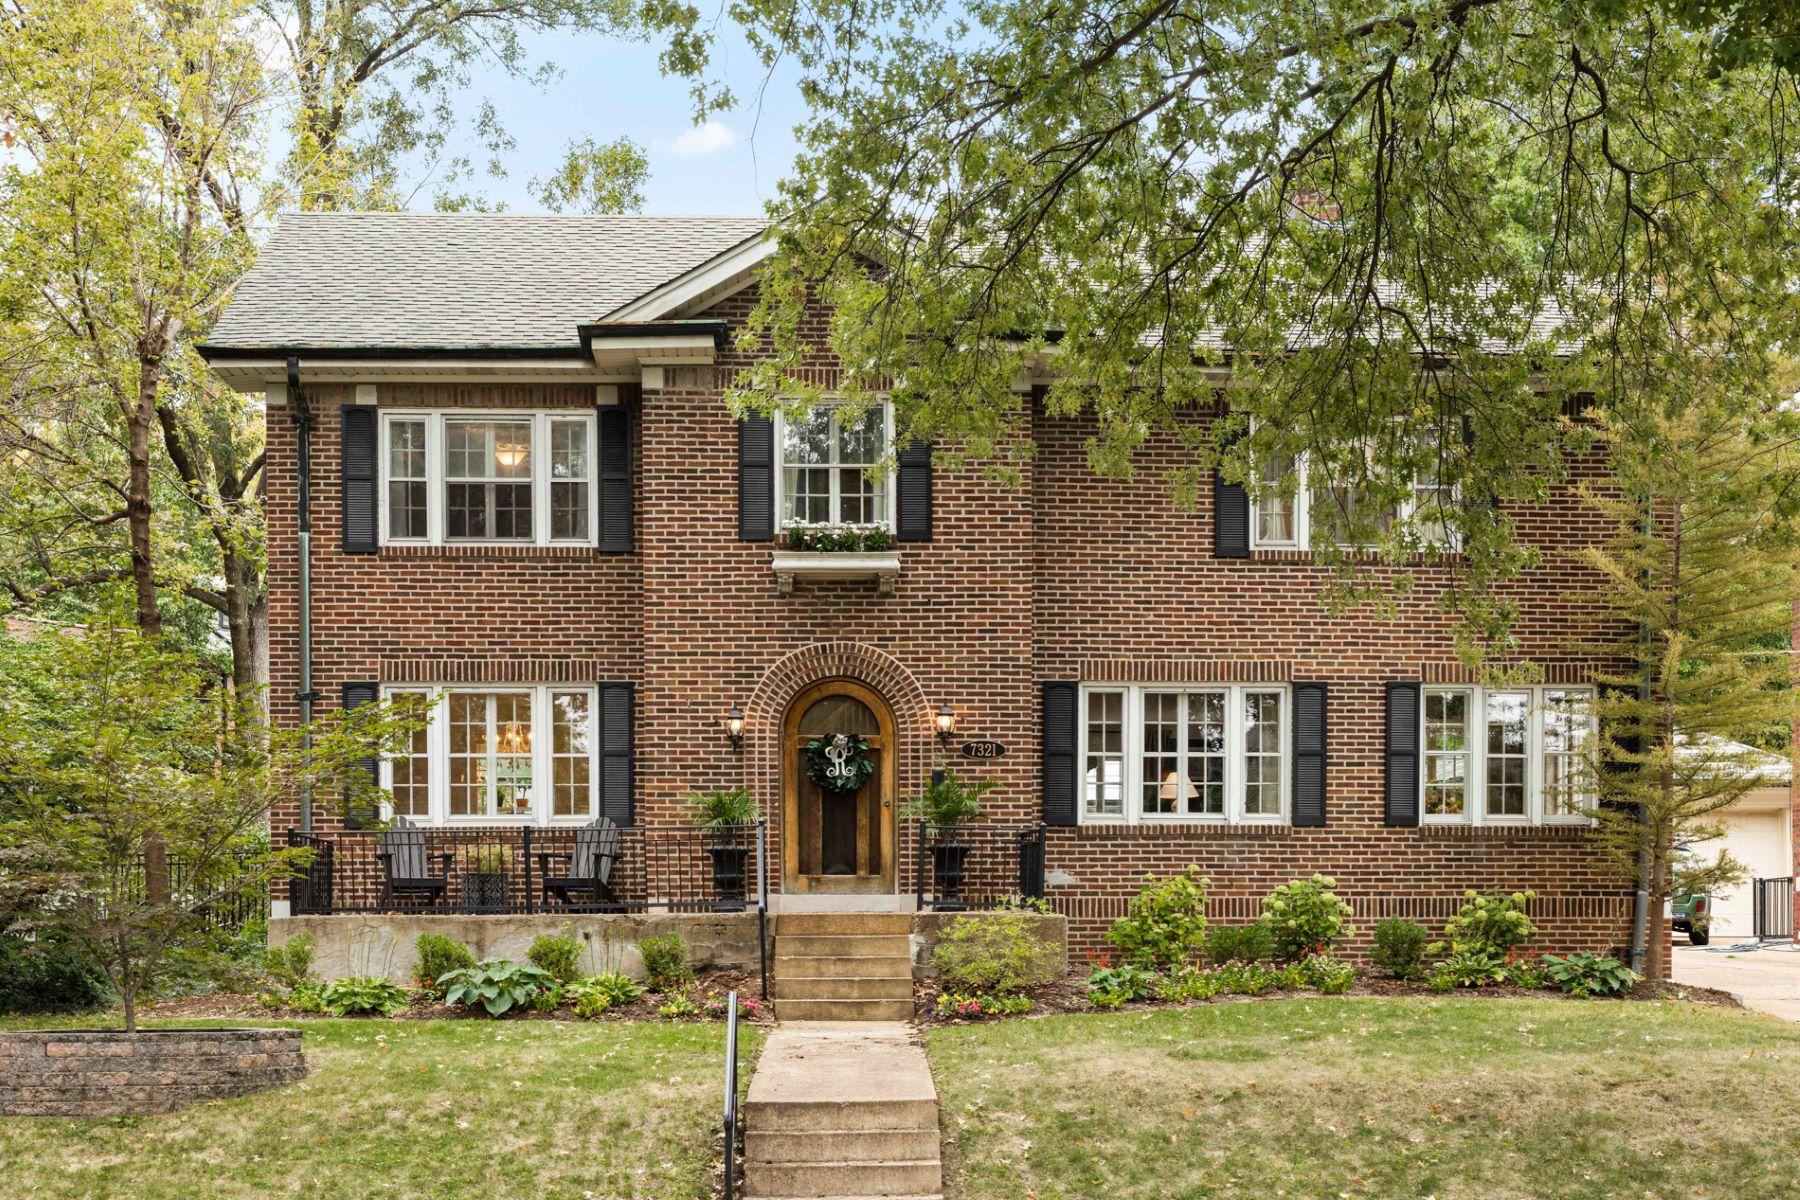 Property for Sale at Kingsbury Blvd 7321 Kingsbury Blvd University City, Missouri 63130 United States